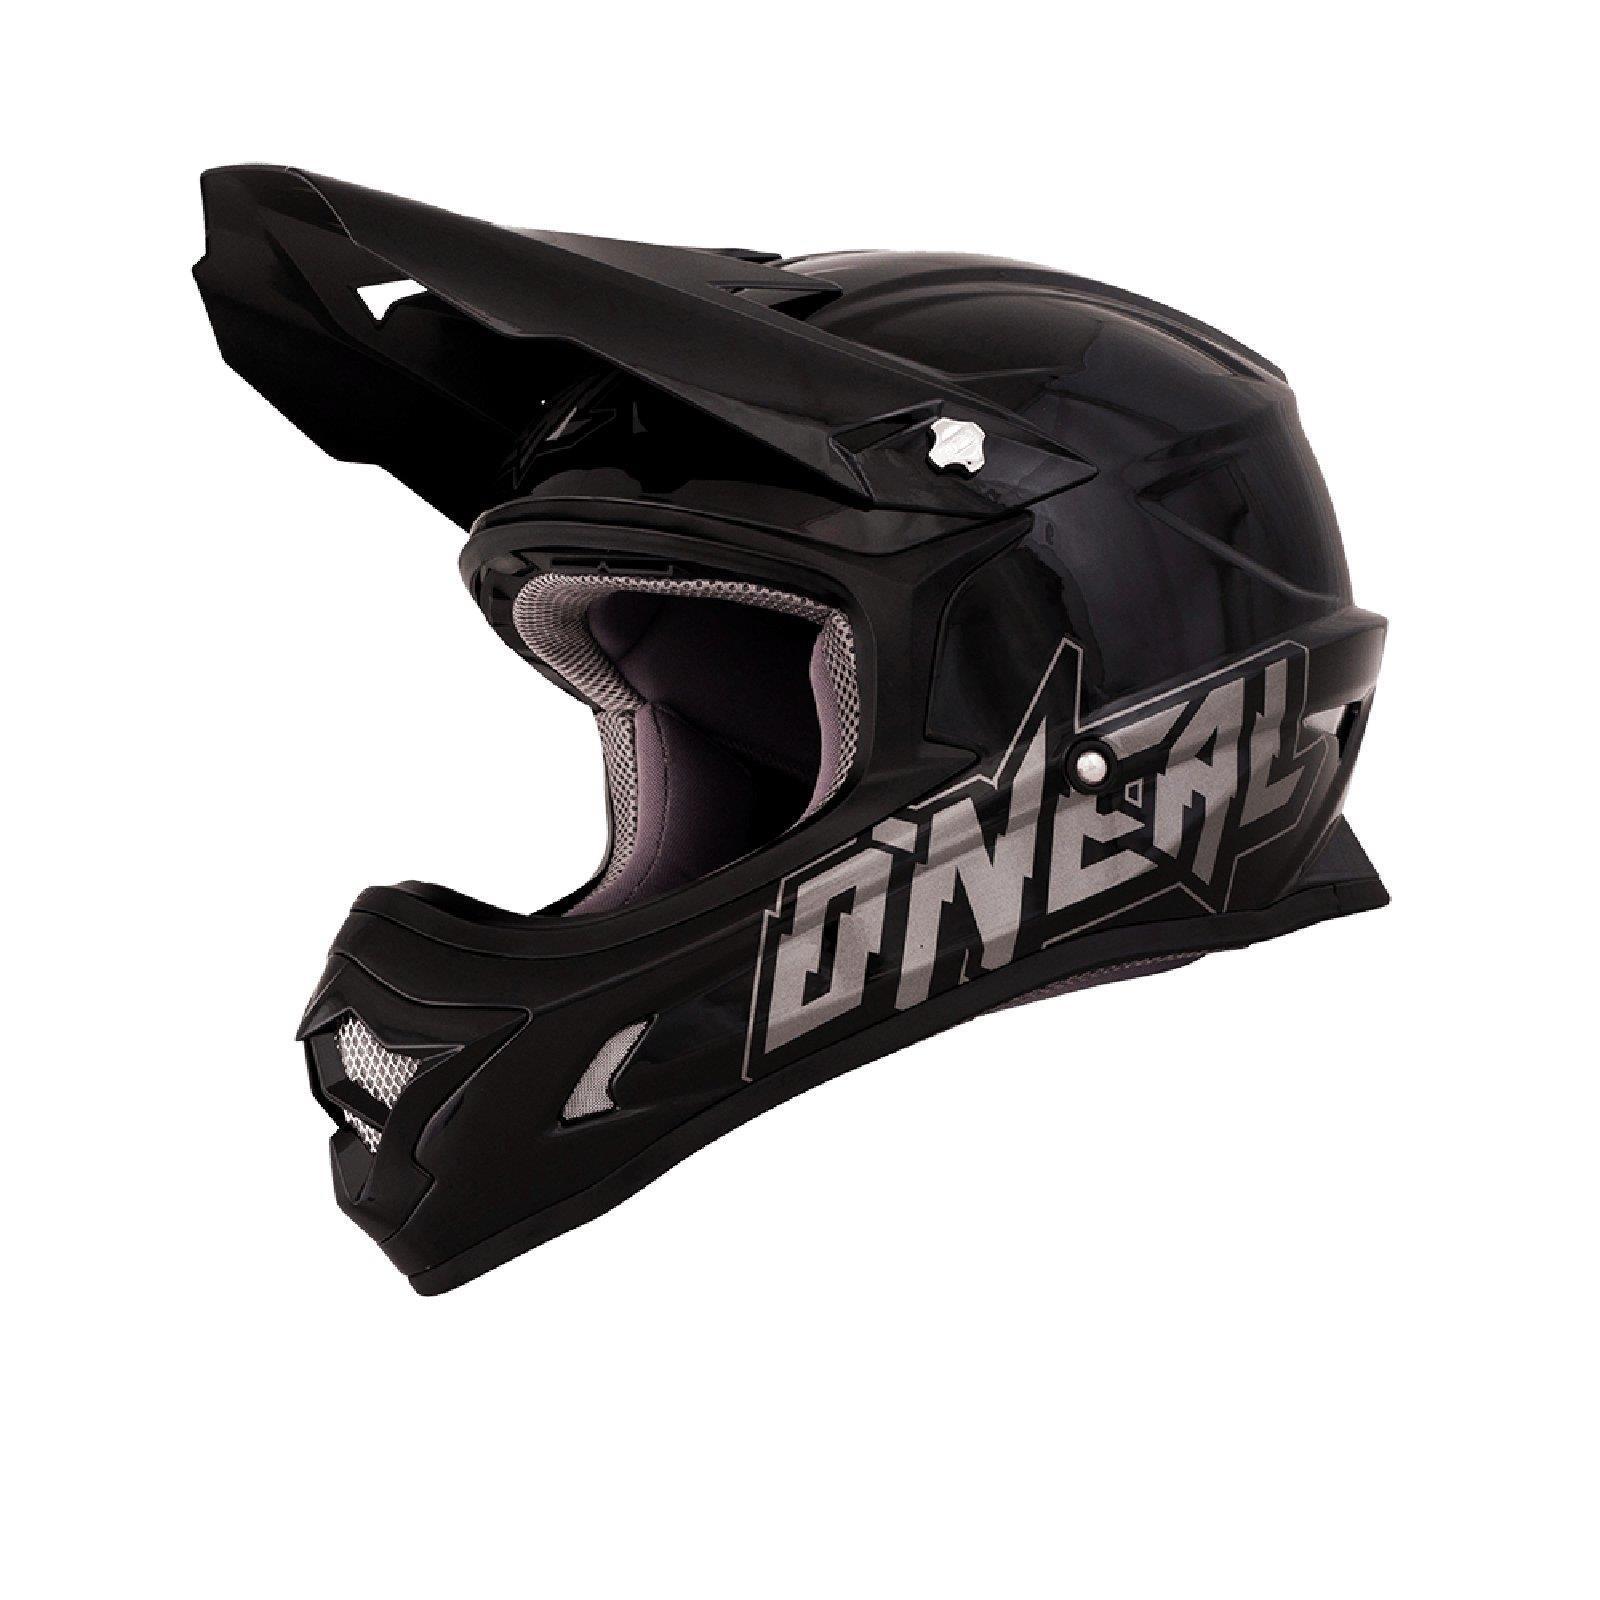 ONeal-Motocross-casco-MX-ENDURO-MOTO-BICI-FUORISTRADA-CROSS-Series-Adventure miniatura 120